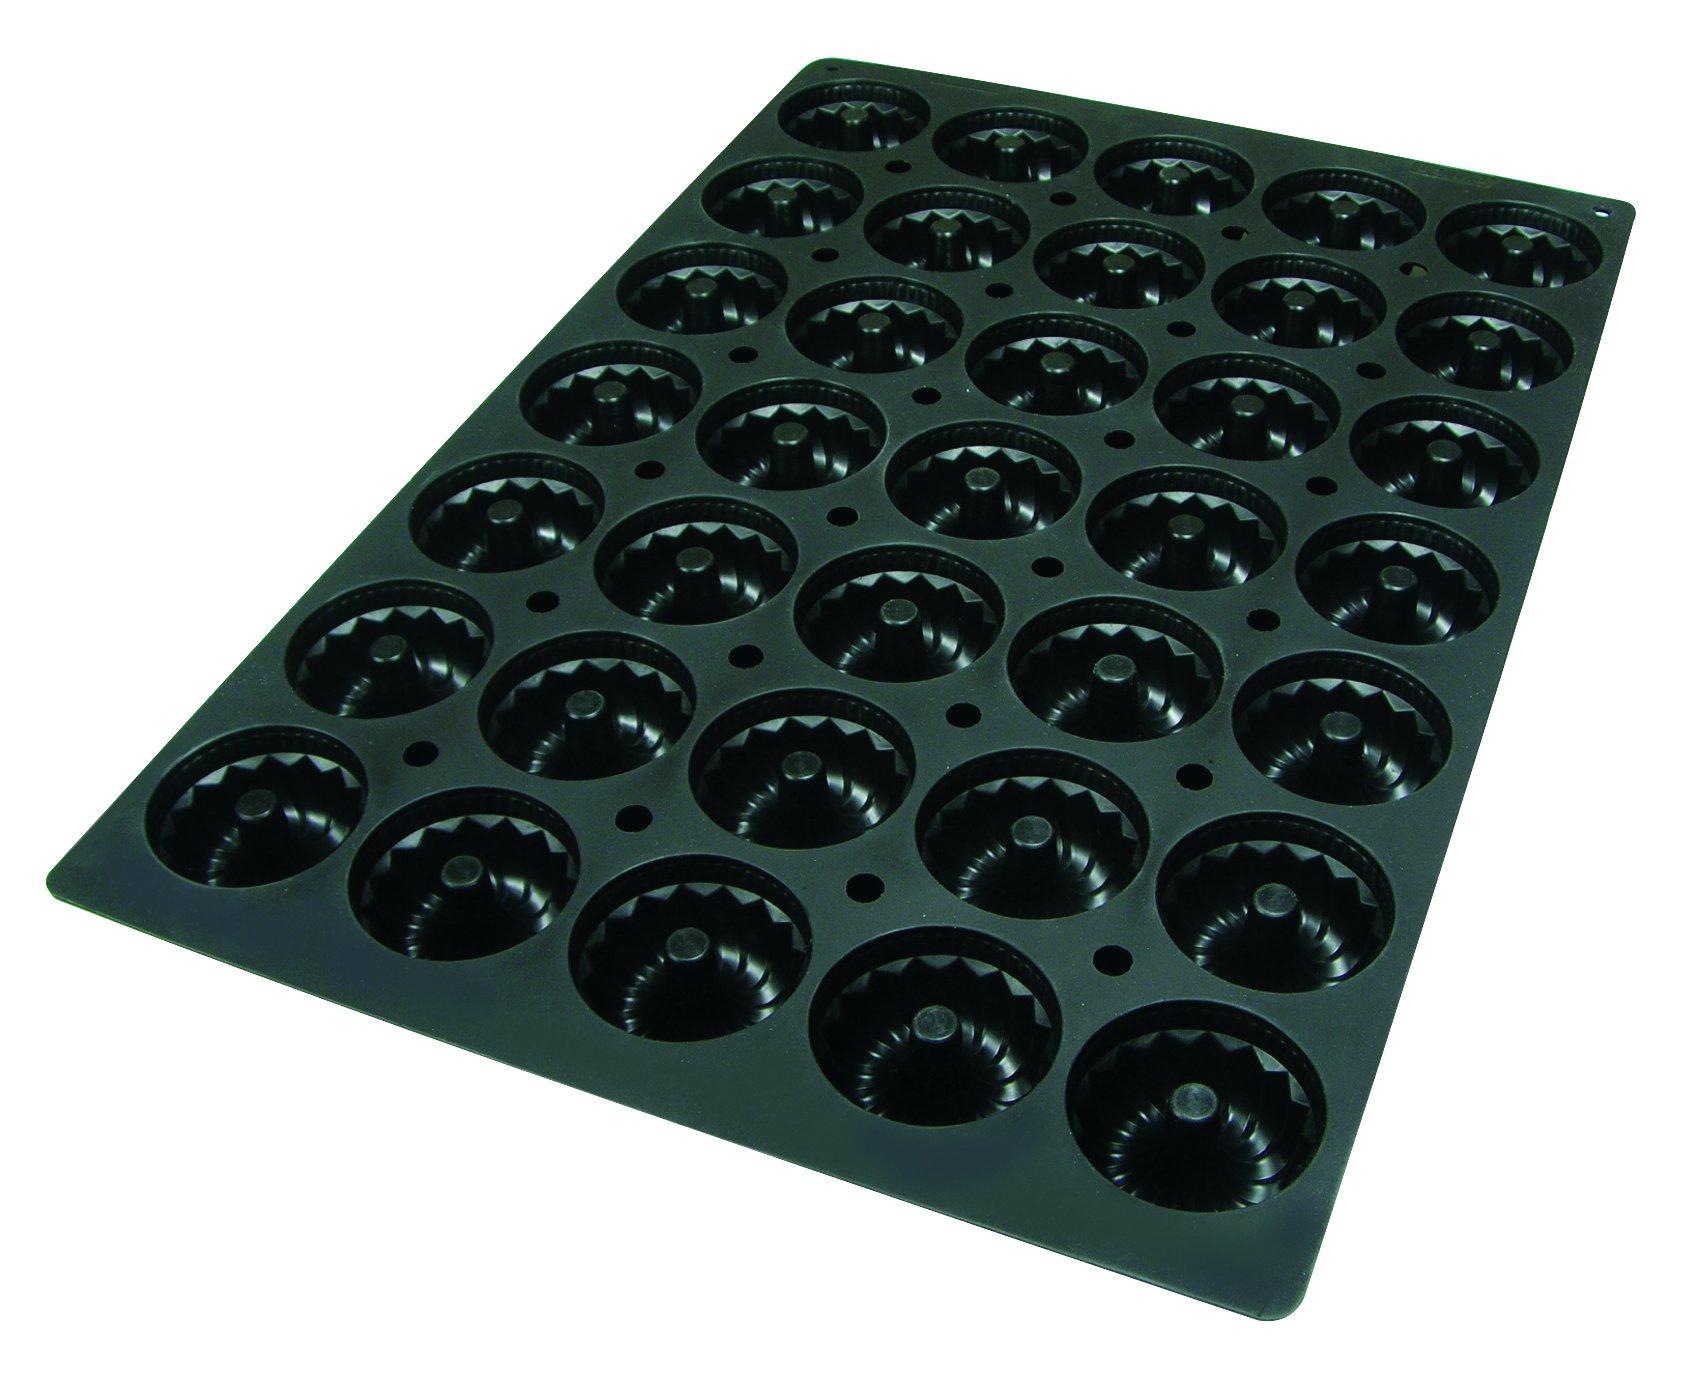 Lekue Professional Baking 35 Cavities Savarin Mold, 23.6'' x 15.7'', Black